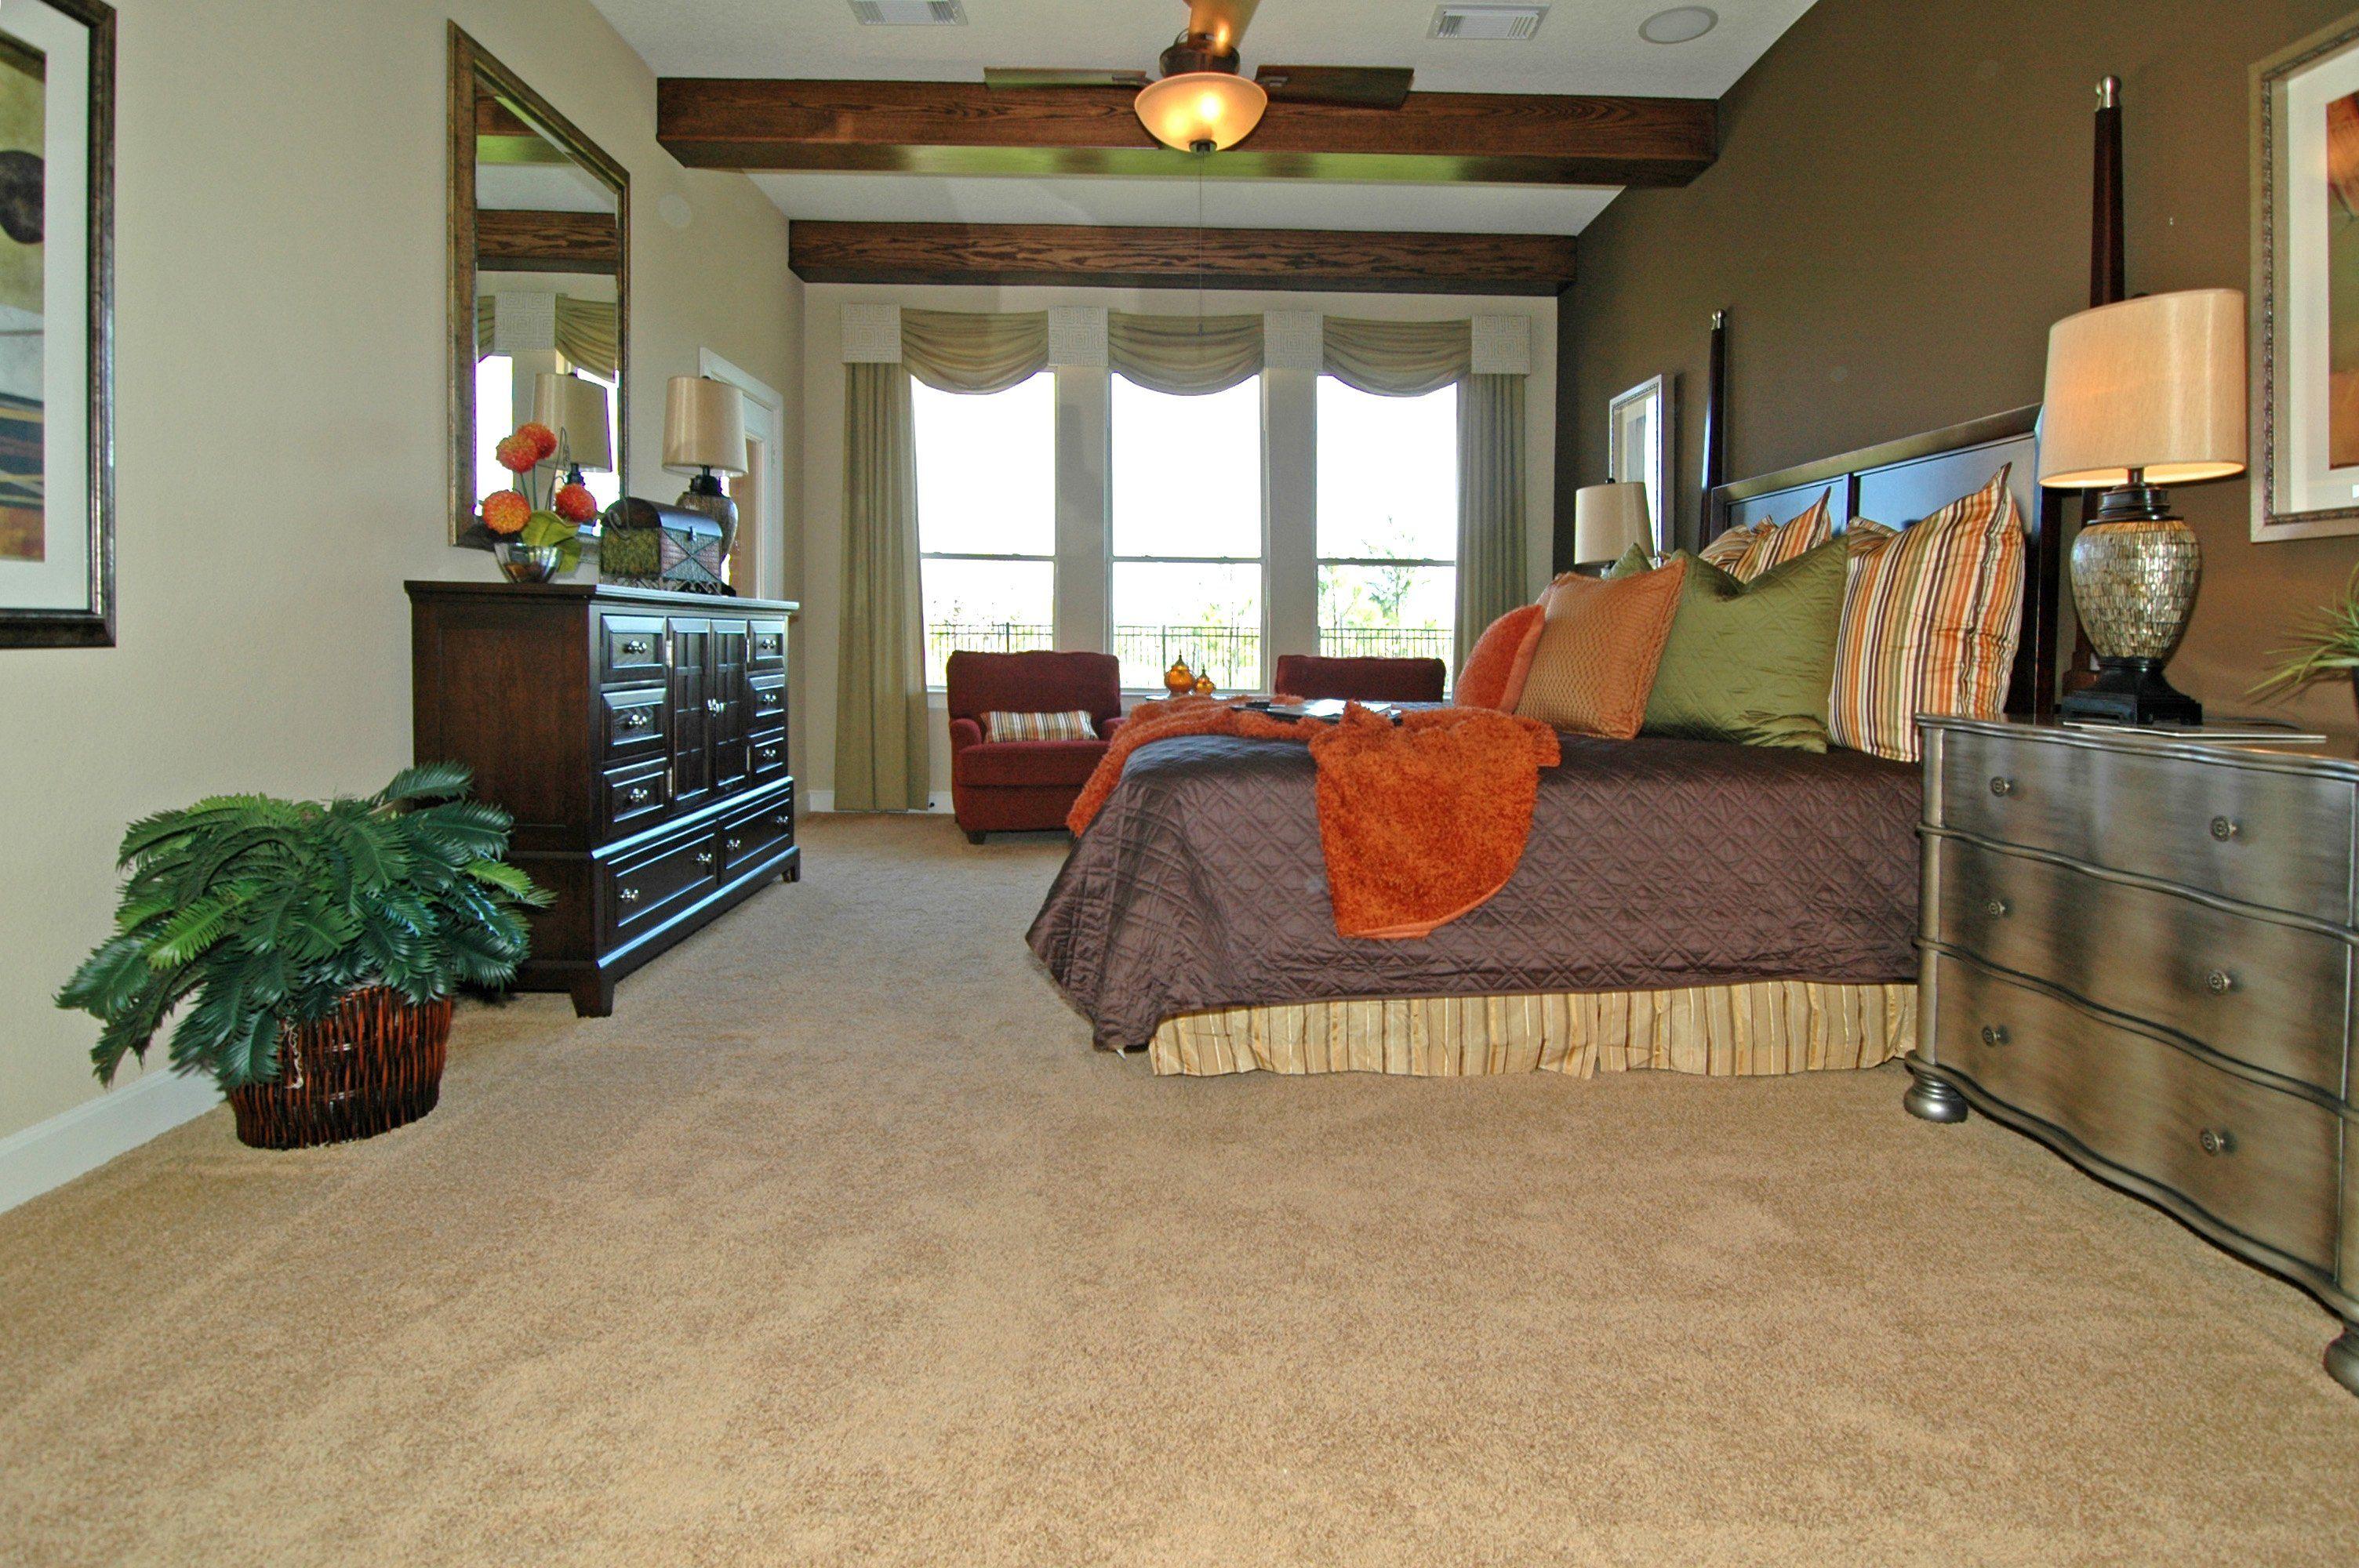 ModelHomeGallery - David Weekley Homes | Bedroom design ... on New Model Bedroom Design  id=38108